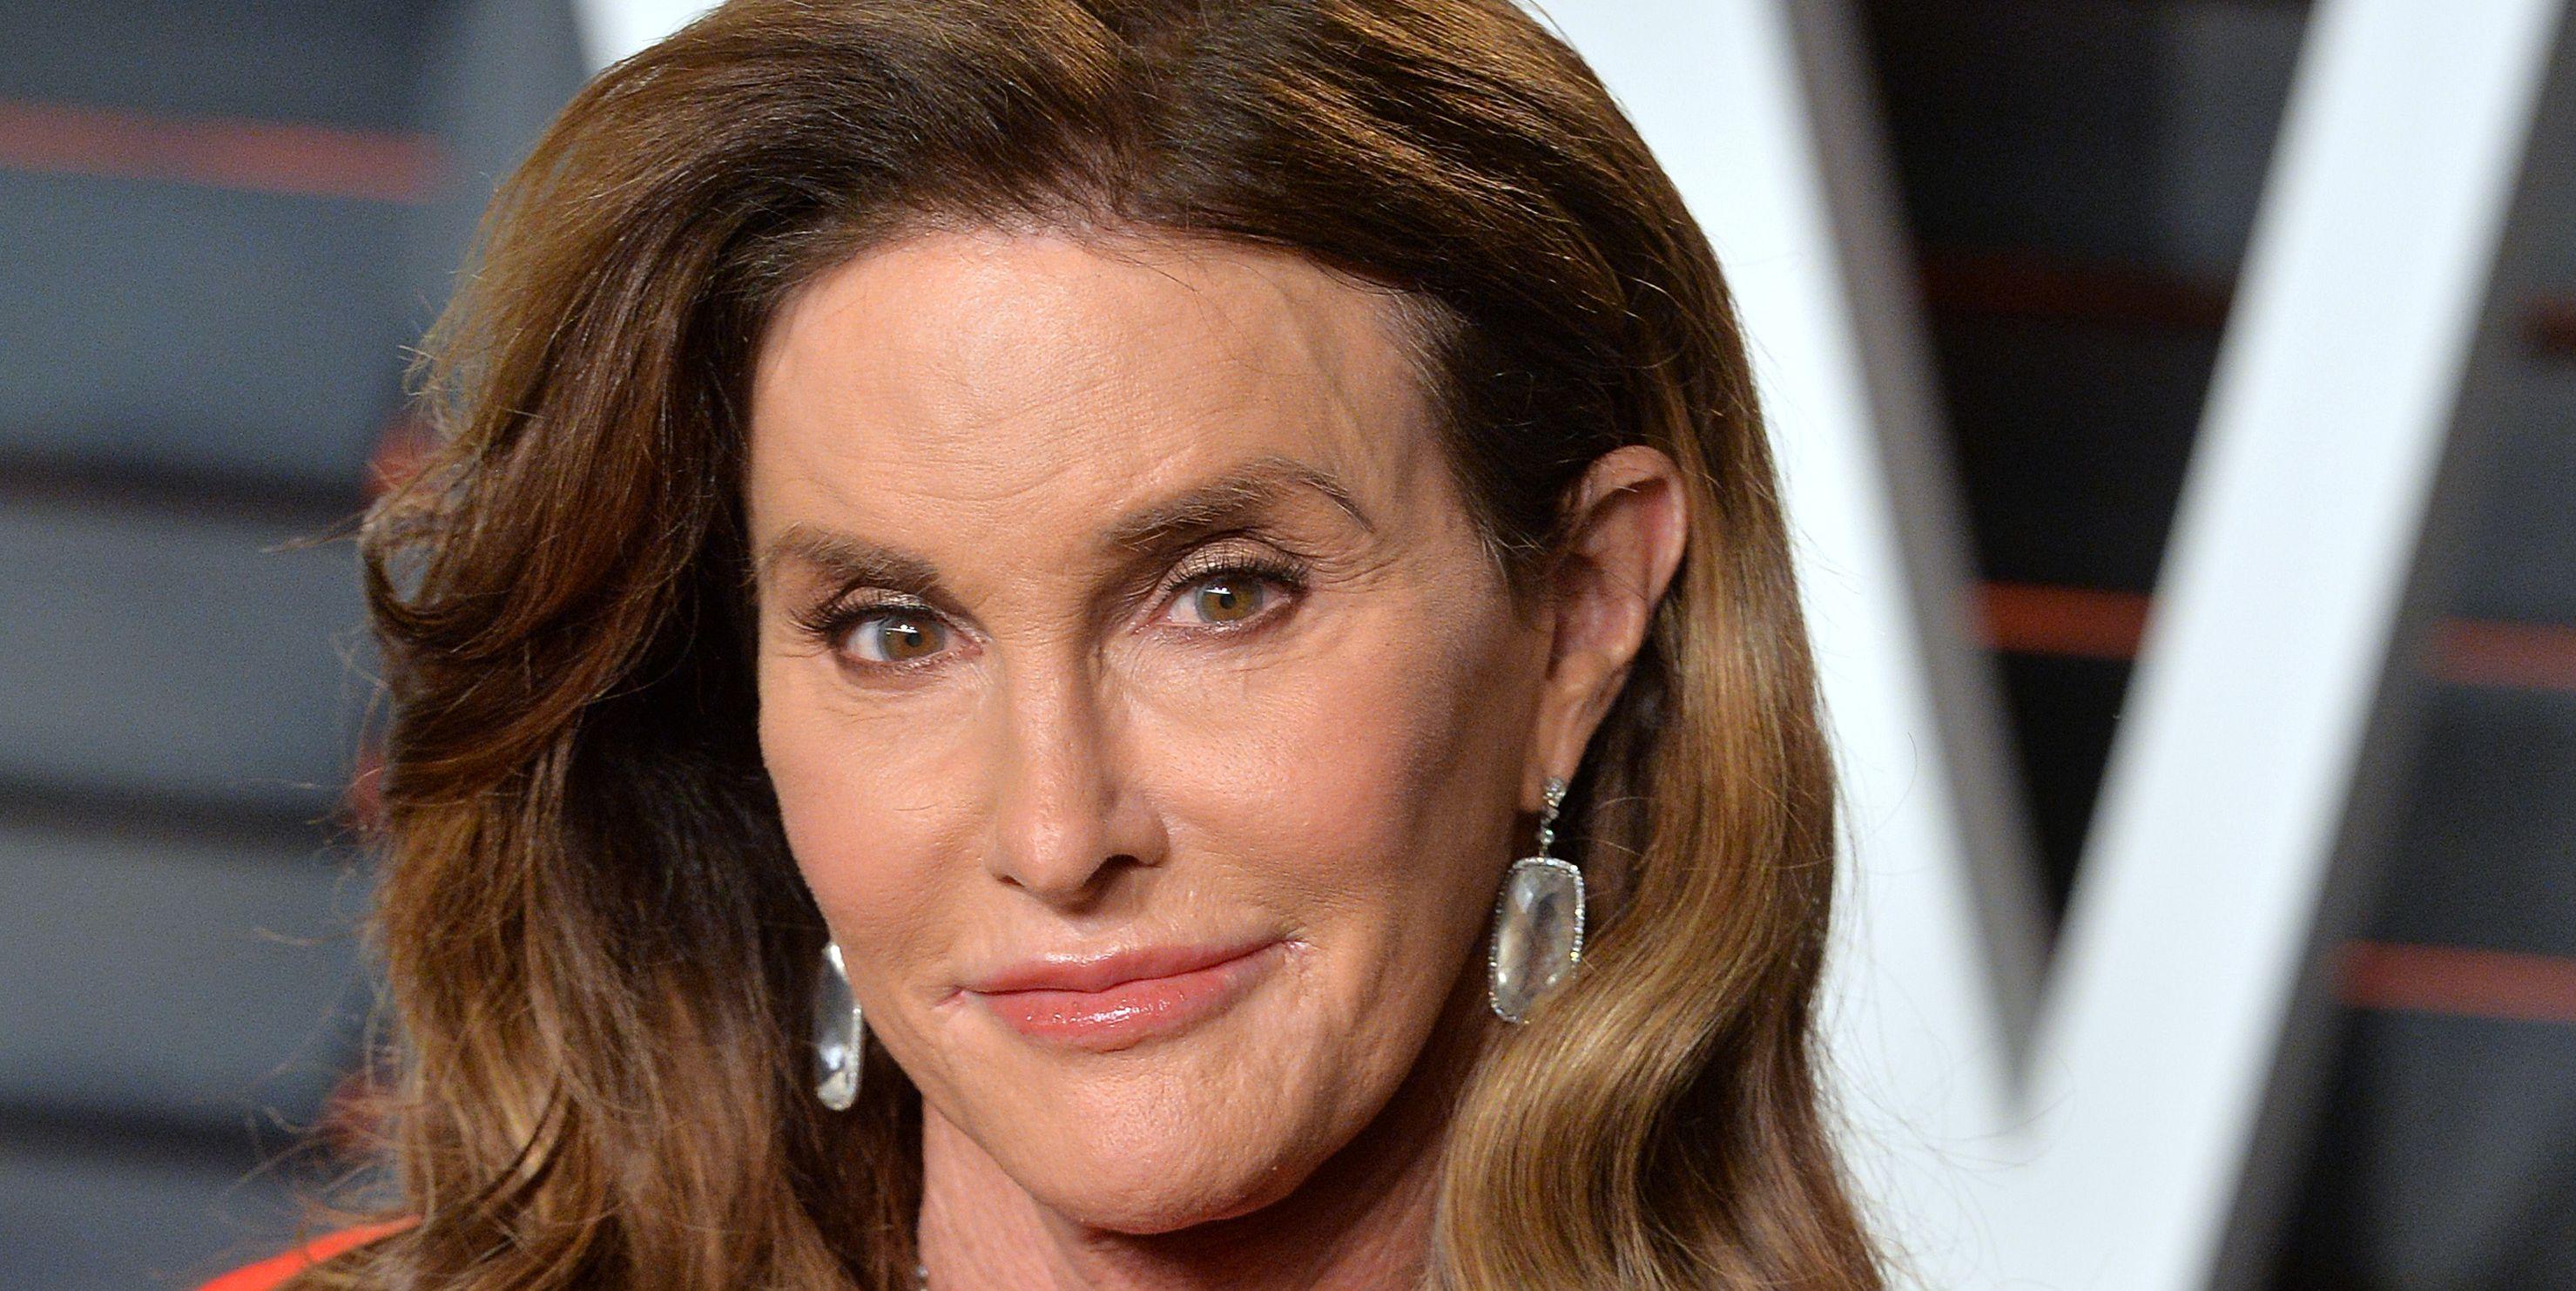 Caitlyn Jenner Speaks Out Against Trump's Transgender Military Ban